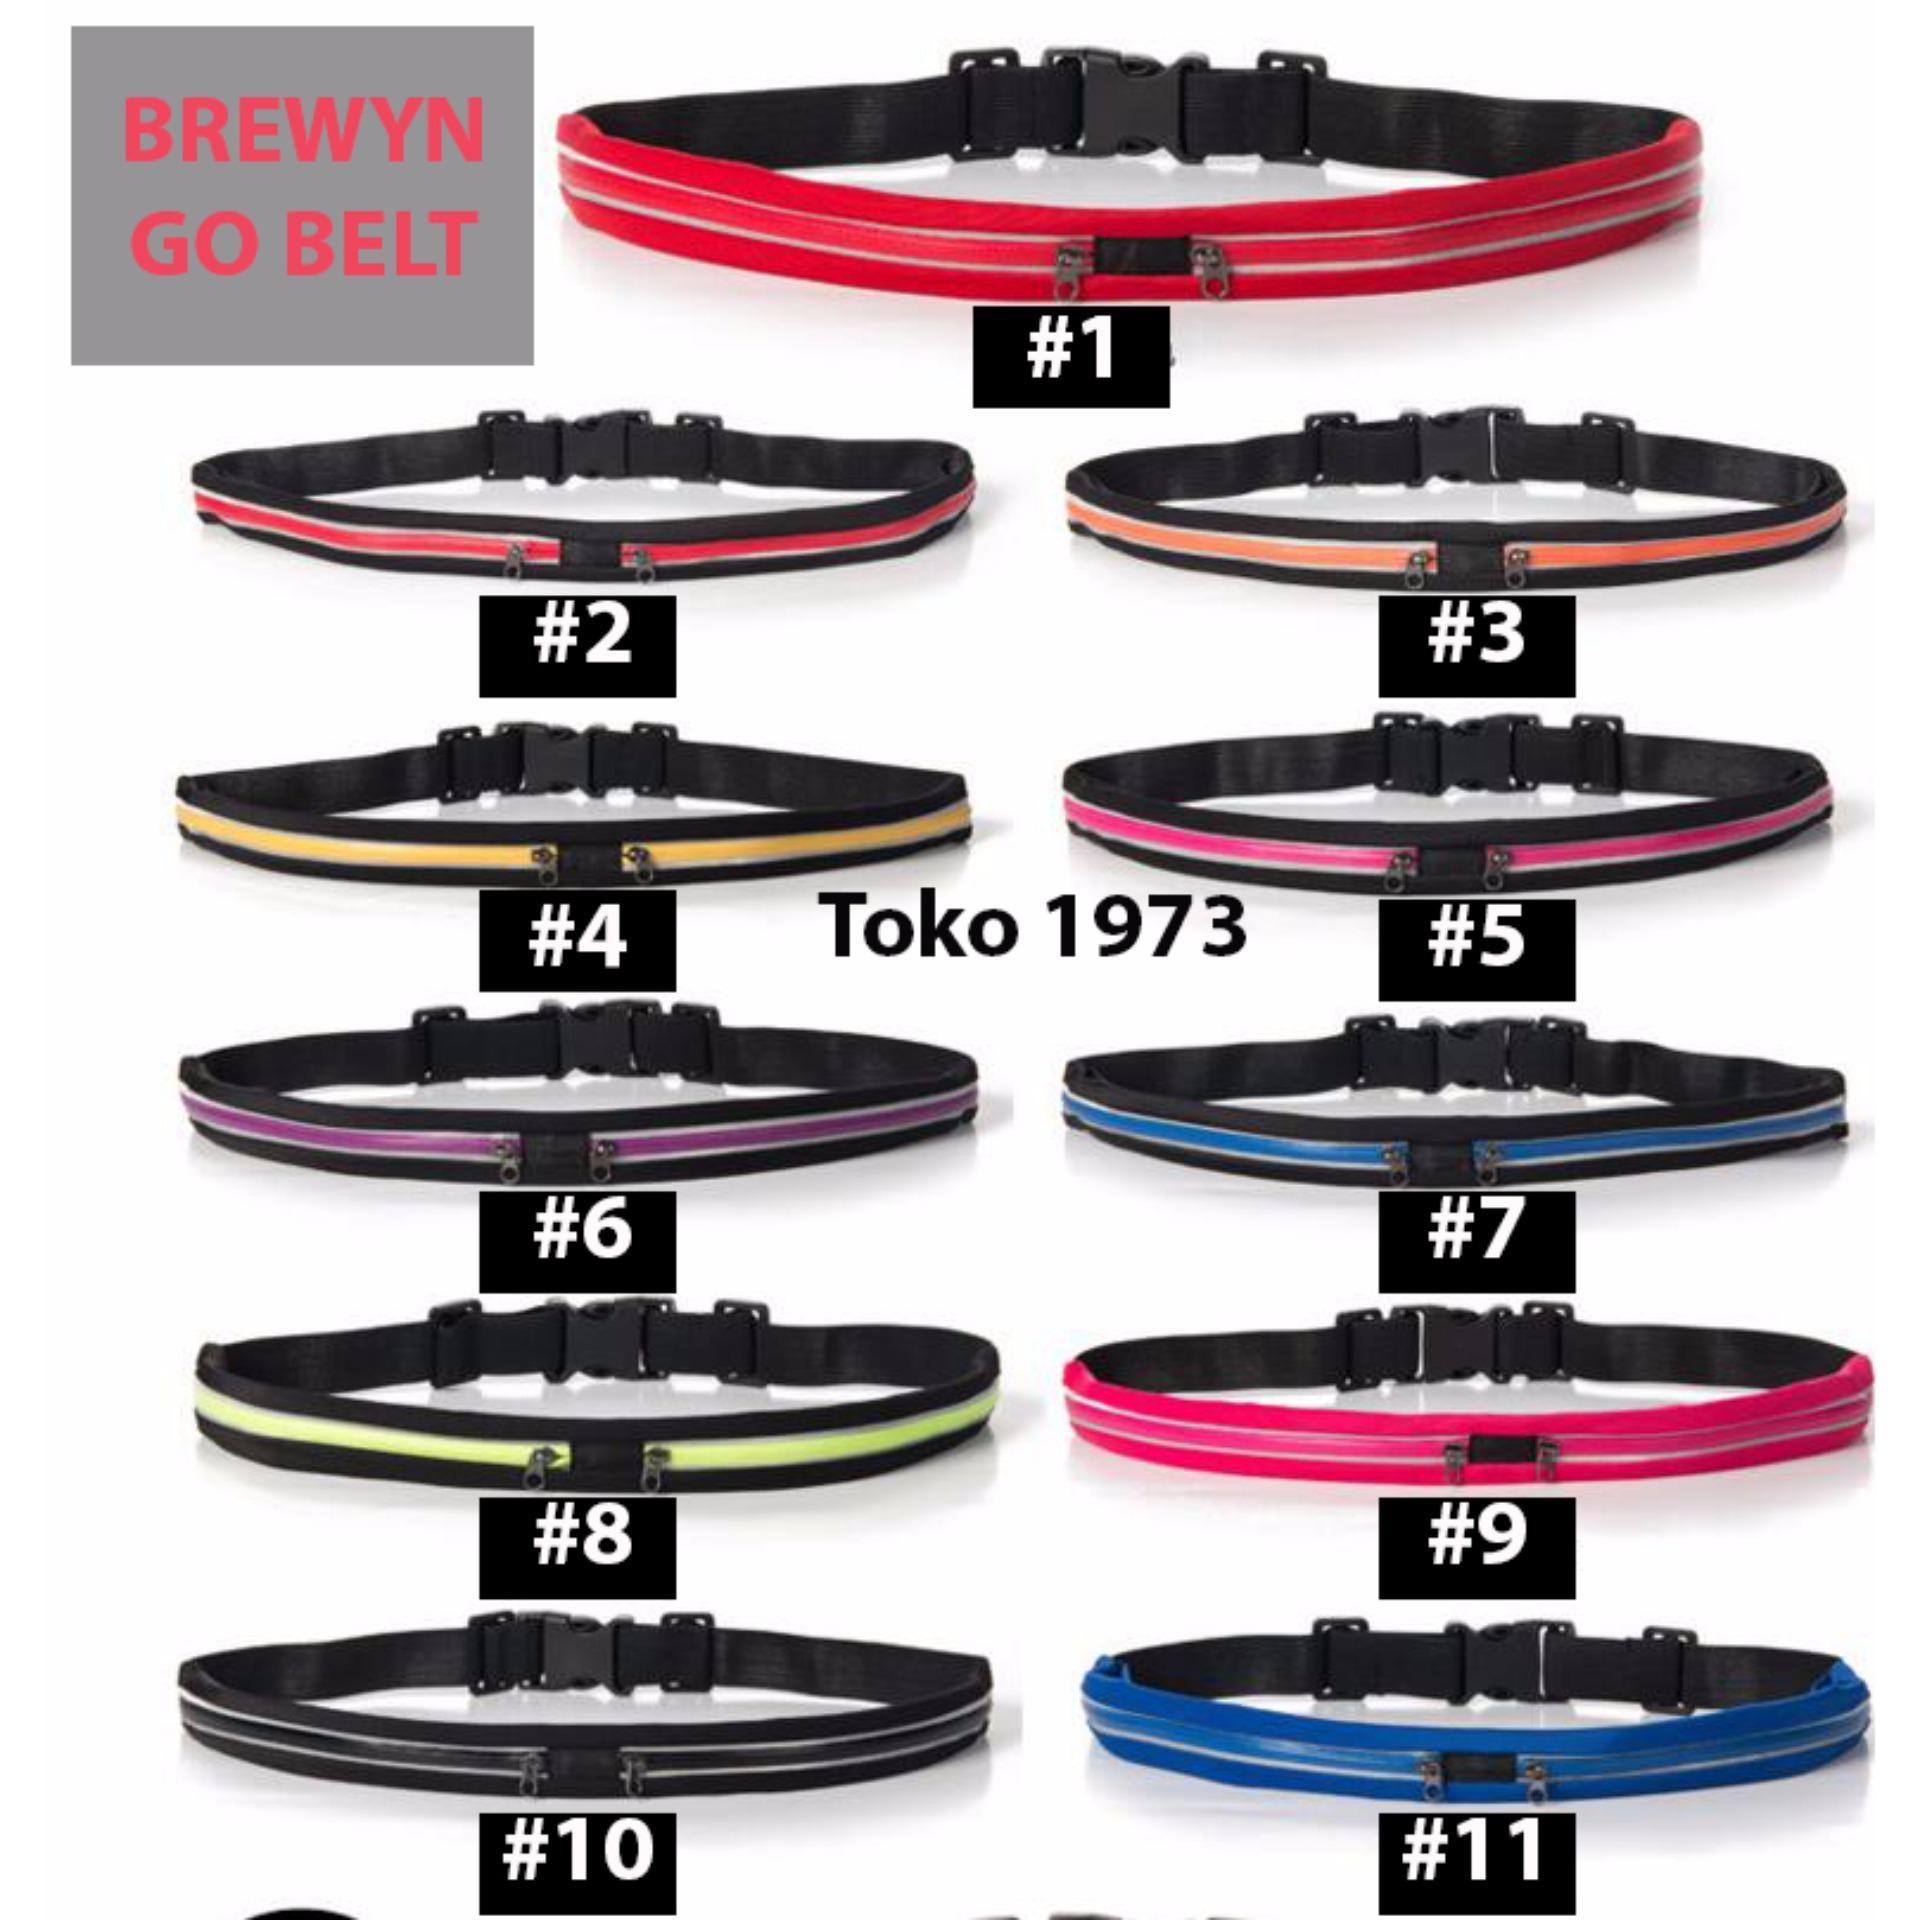 GO BELT BREWYN- belt/ikat pinggang multifungsi untuk sport/travelling - SOLID PINK